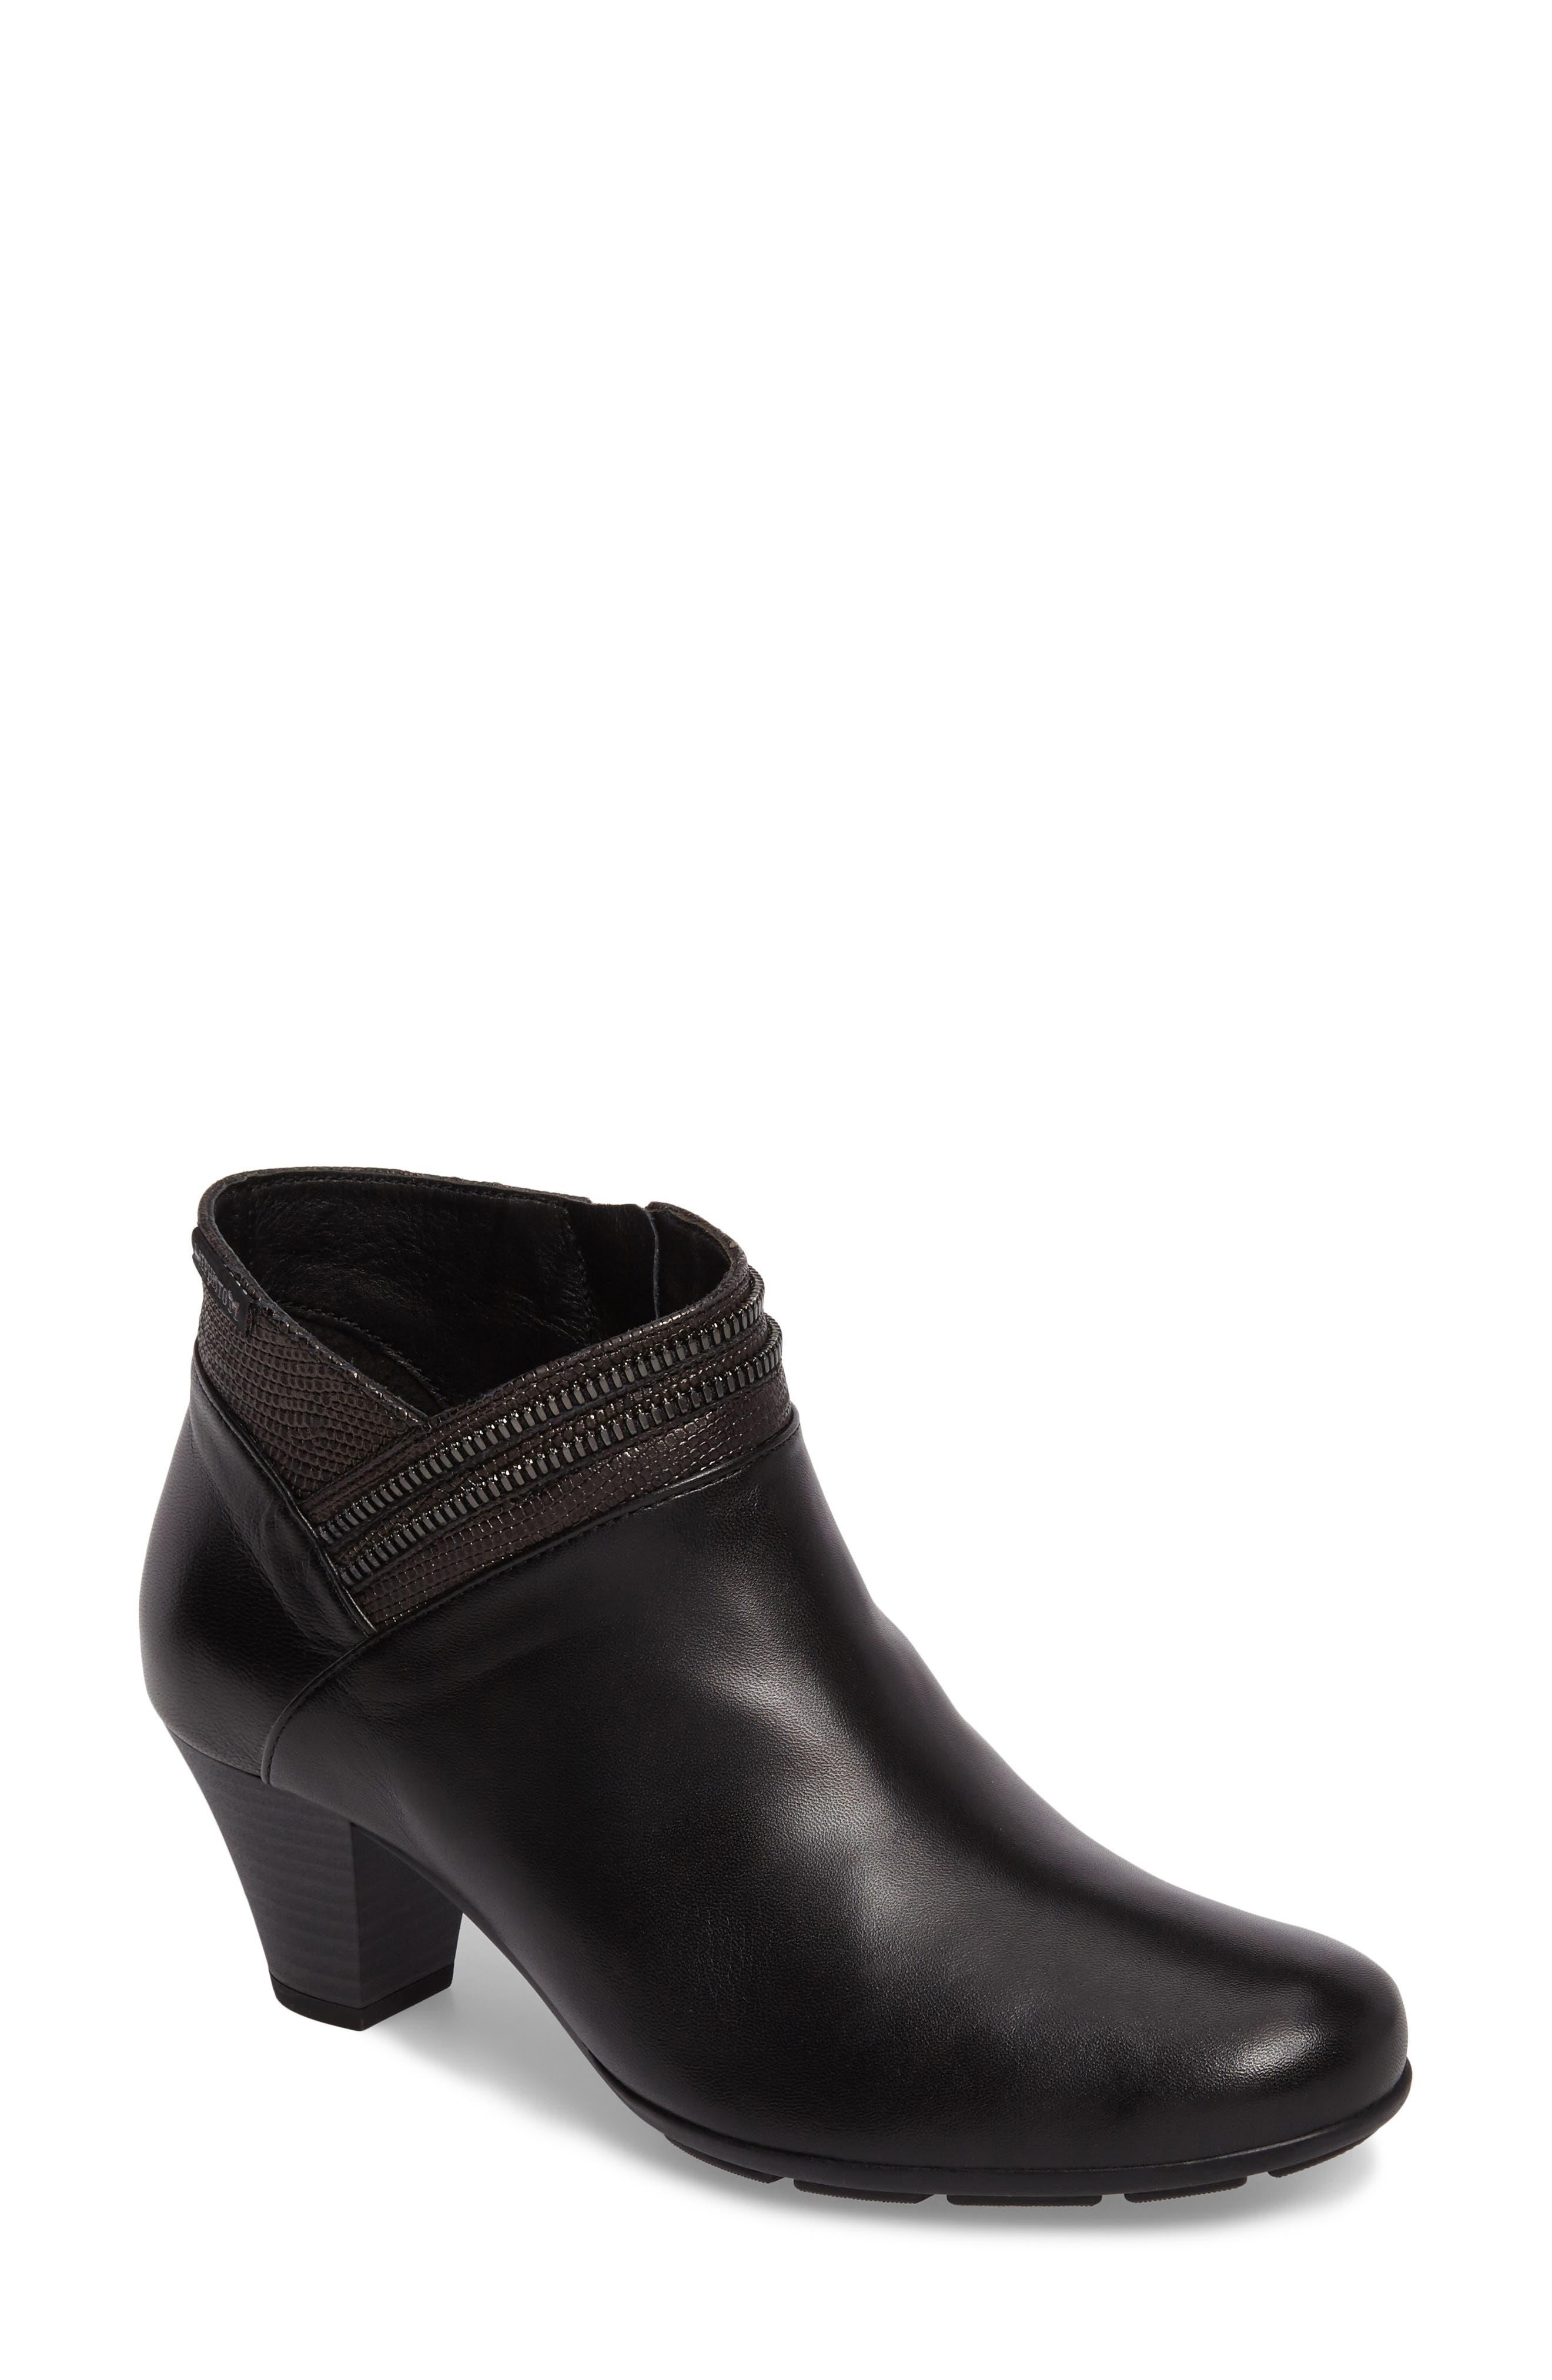 Britie Bootie,                         Main,                         color, Black Leather